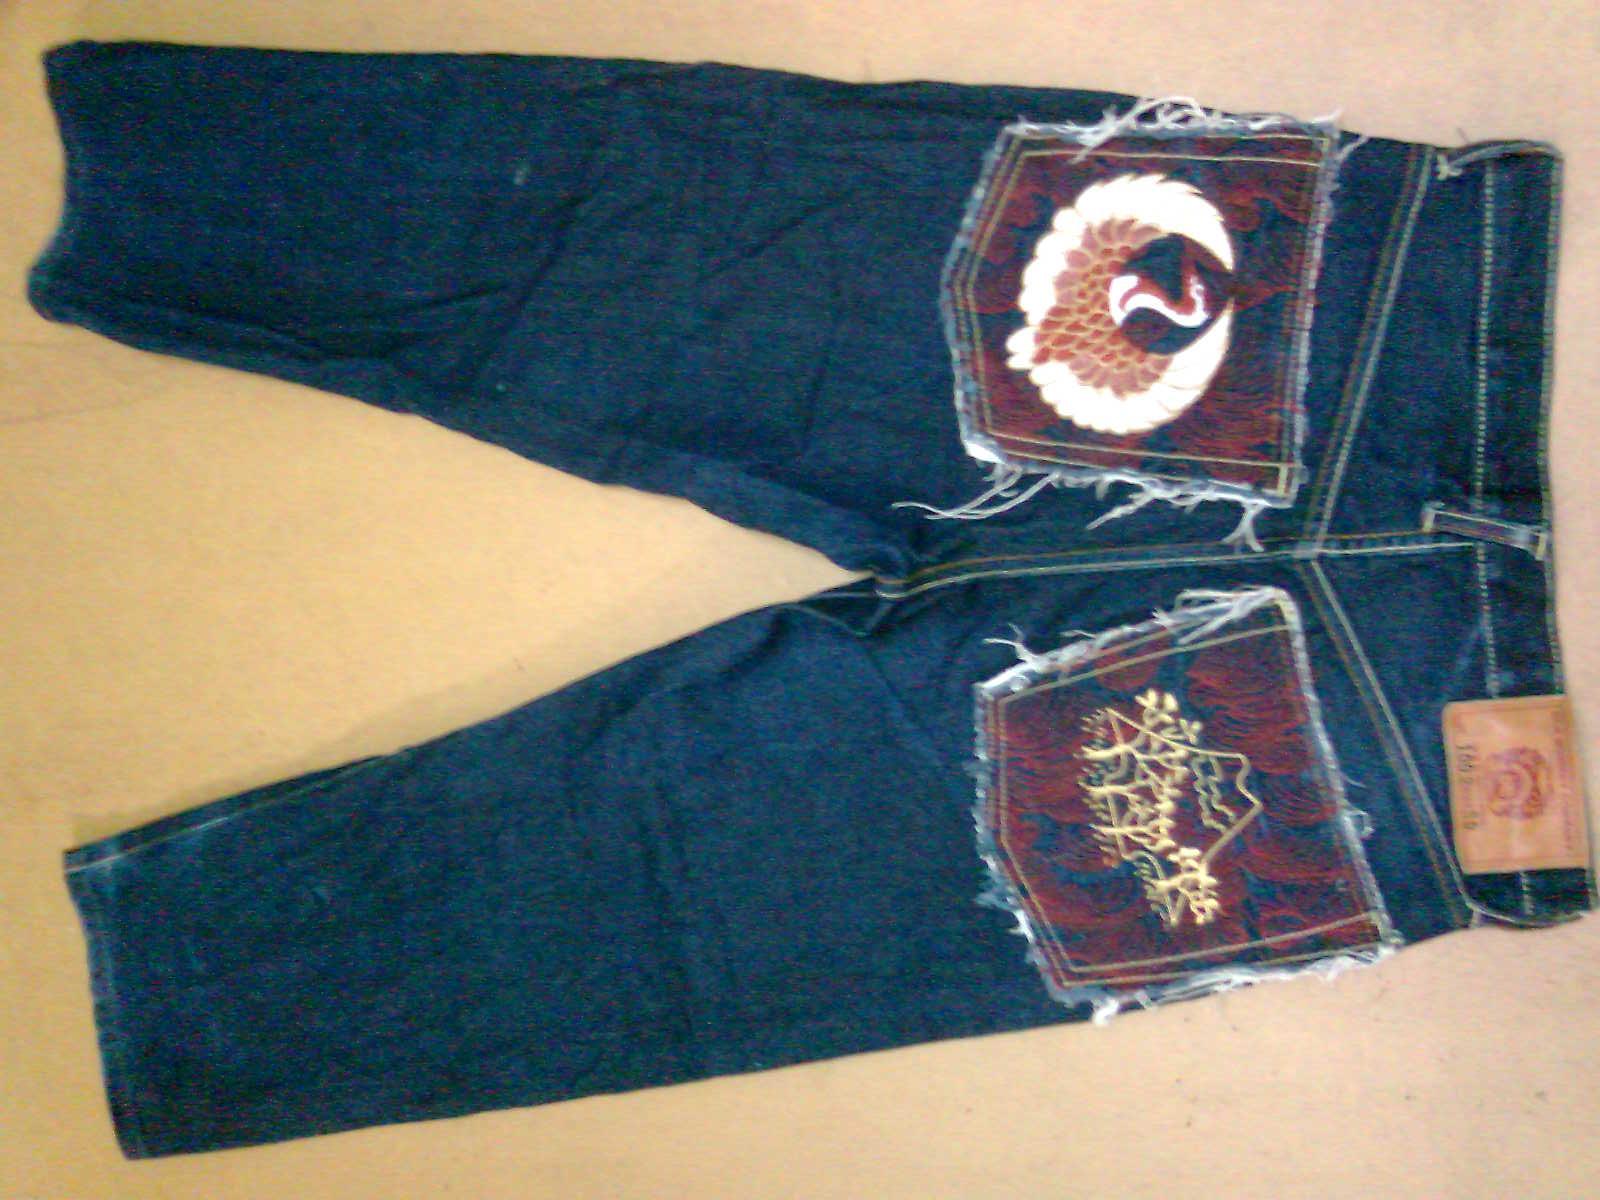 gilagilabundle com red monkey company rmc jeans